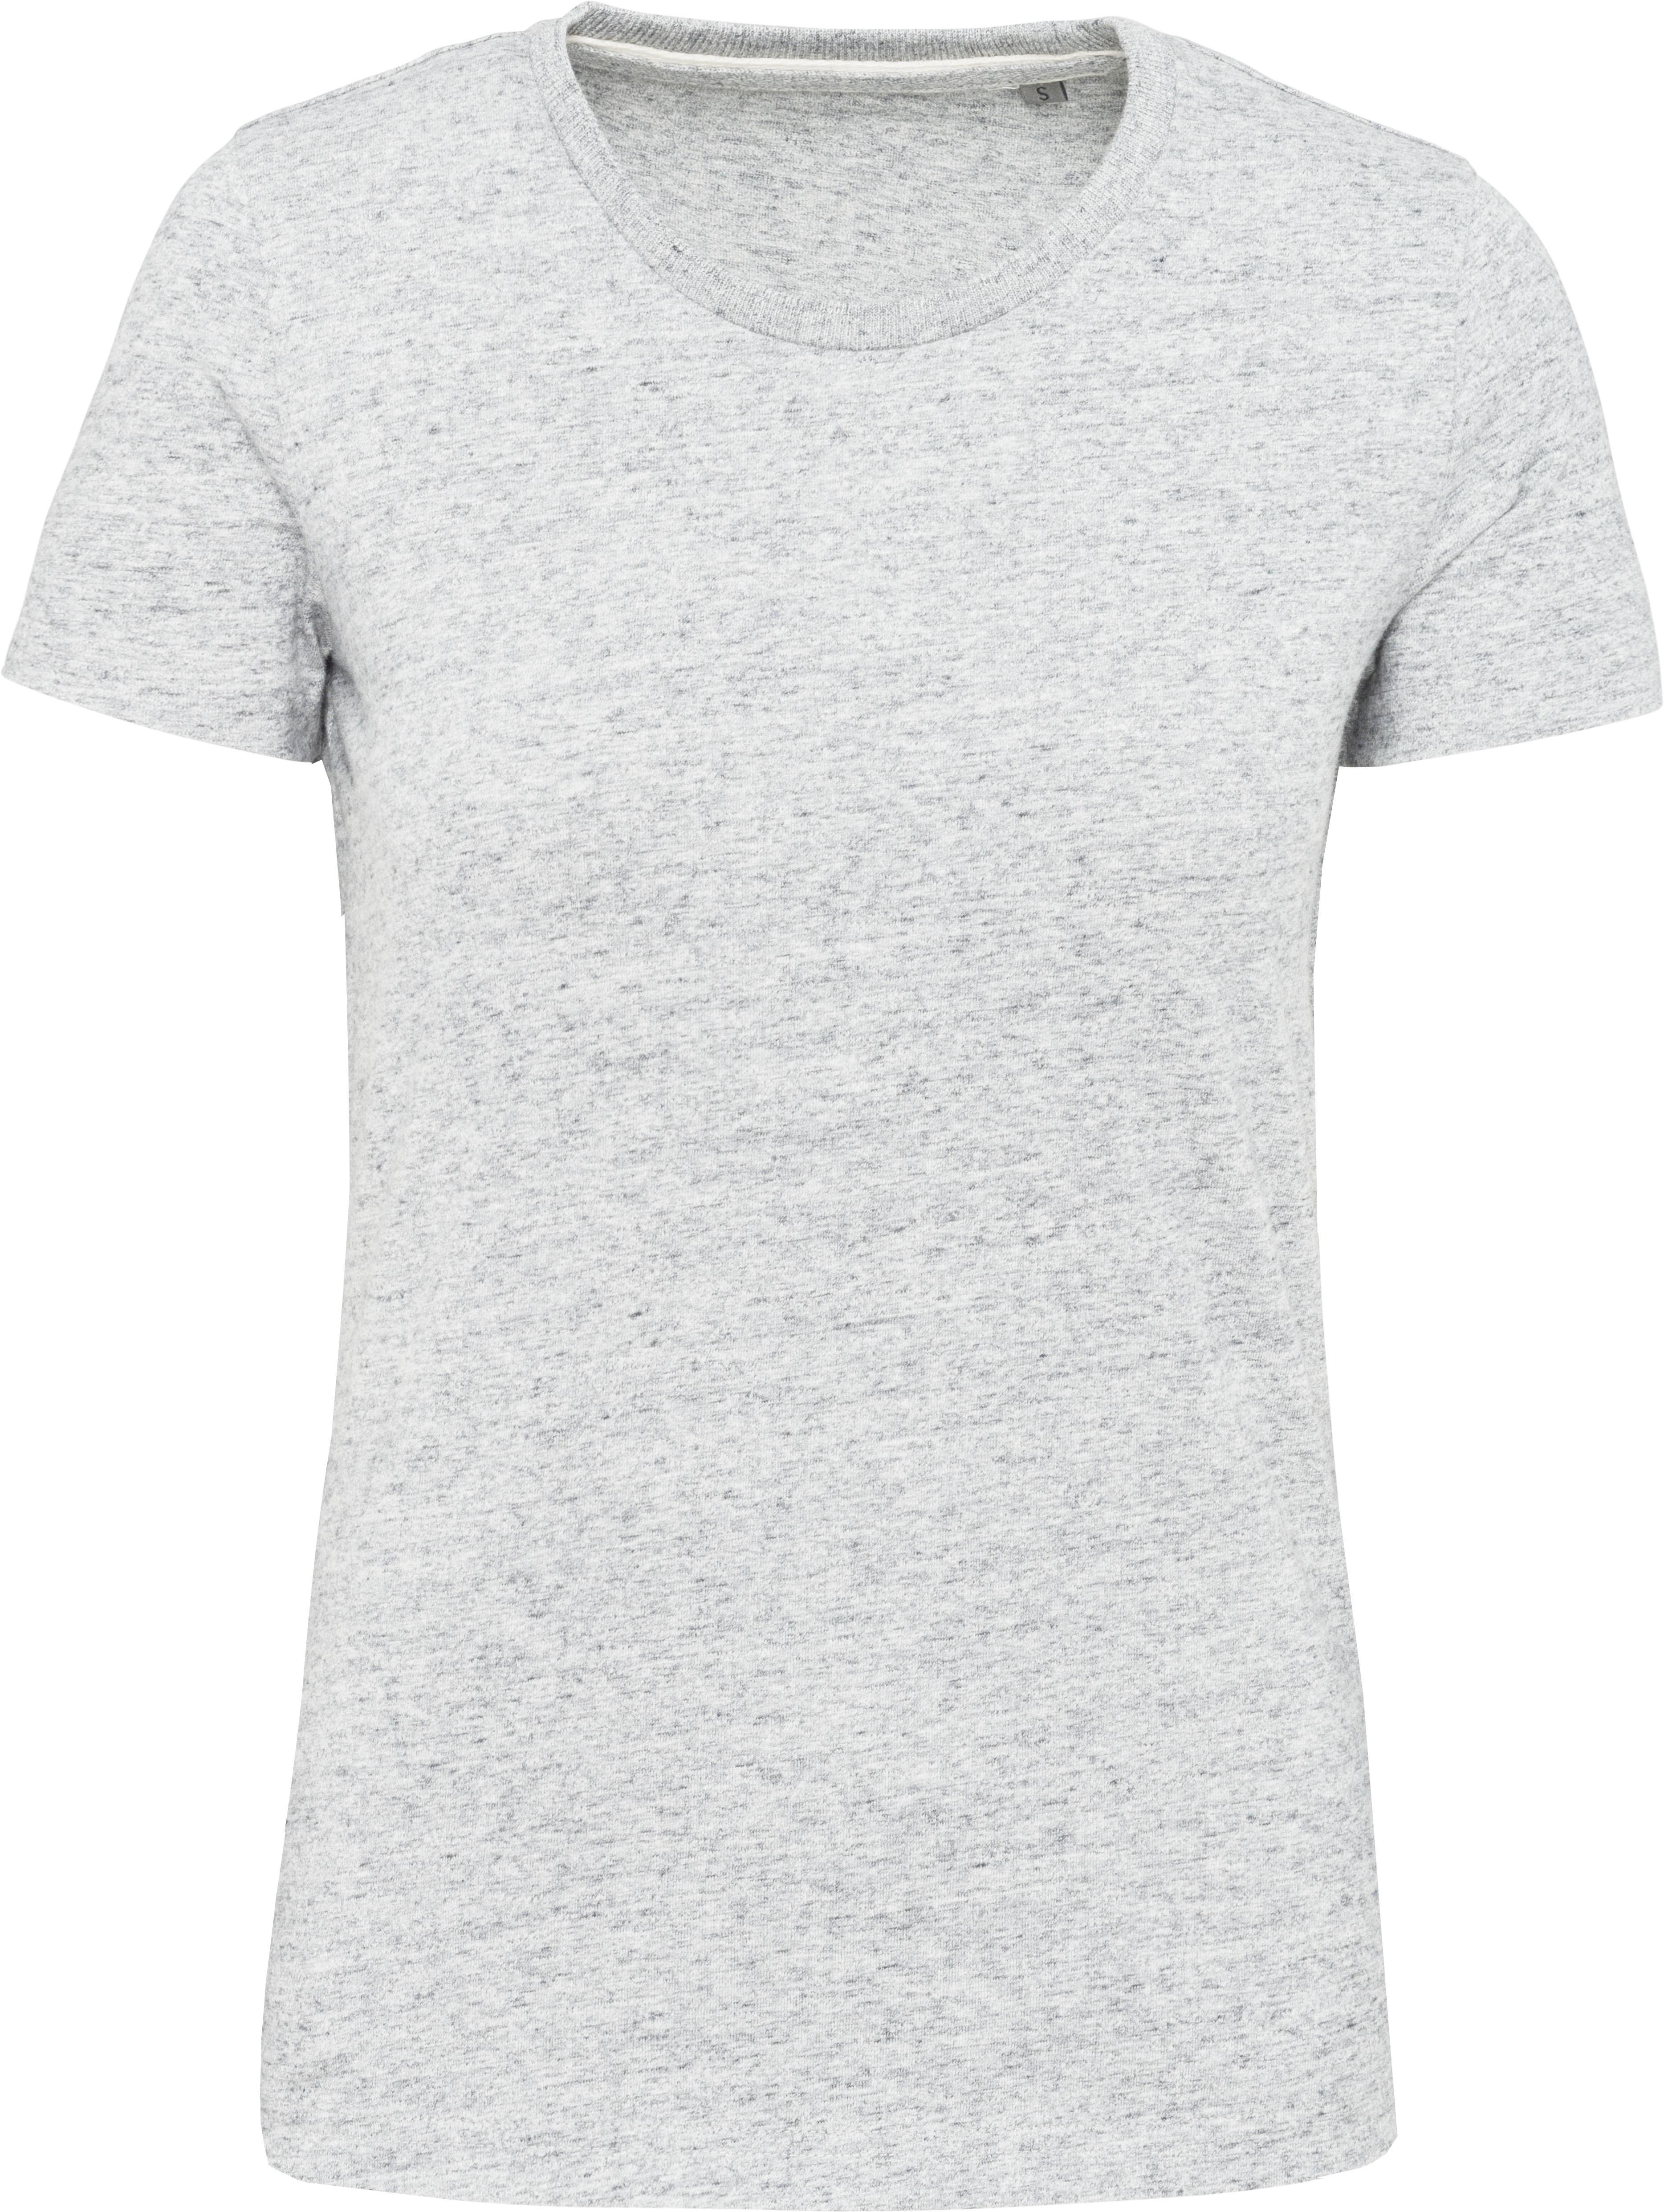 Tee-shirt vintage manches courtes femme - 2-1527-9